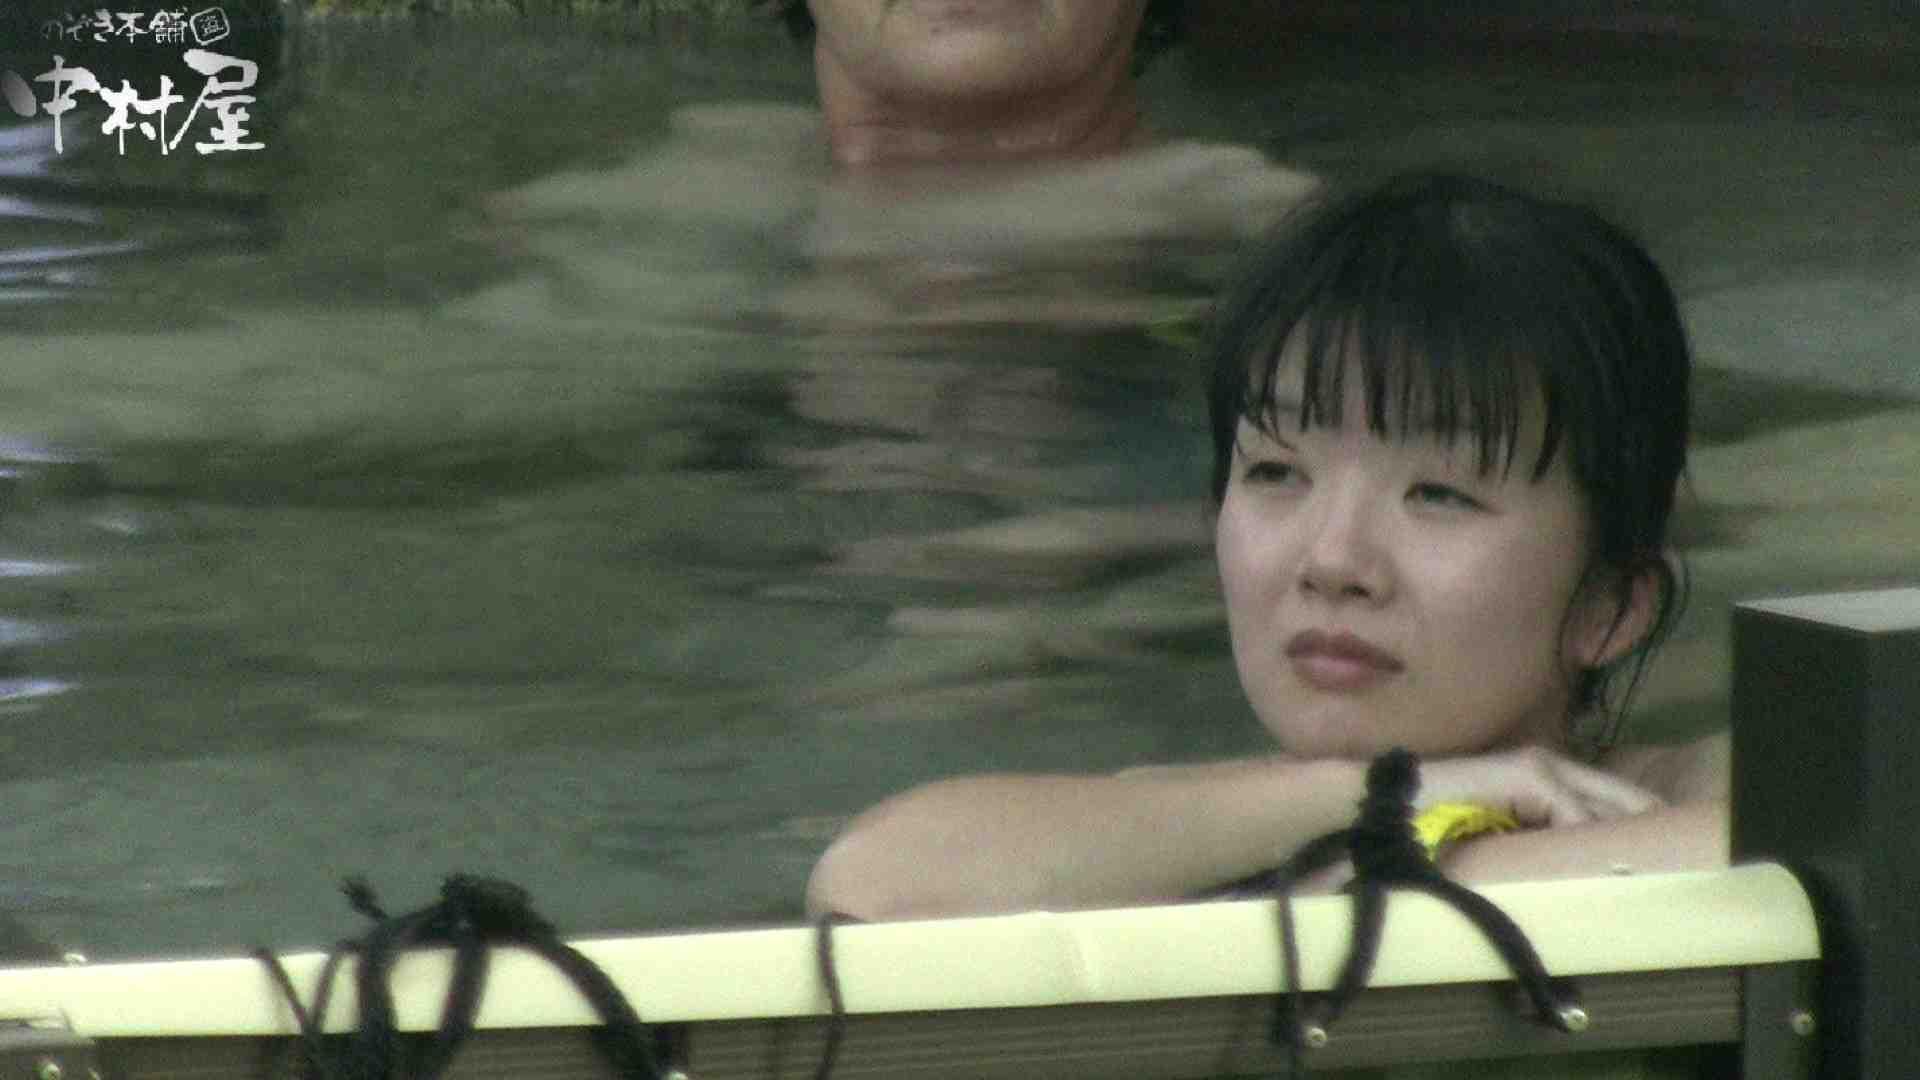 Aquaな露天風呂Vol.904 露天風呂 AV無料動画キャプチャ 56連発 17